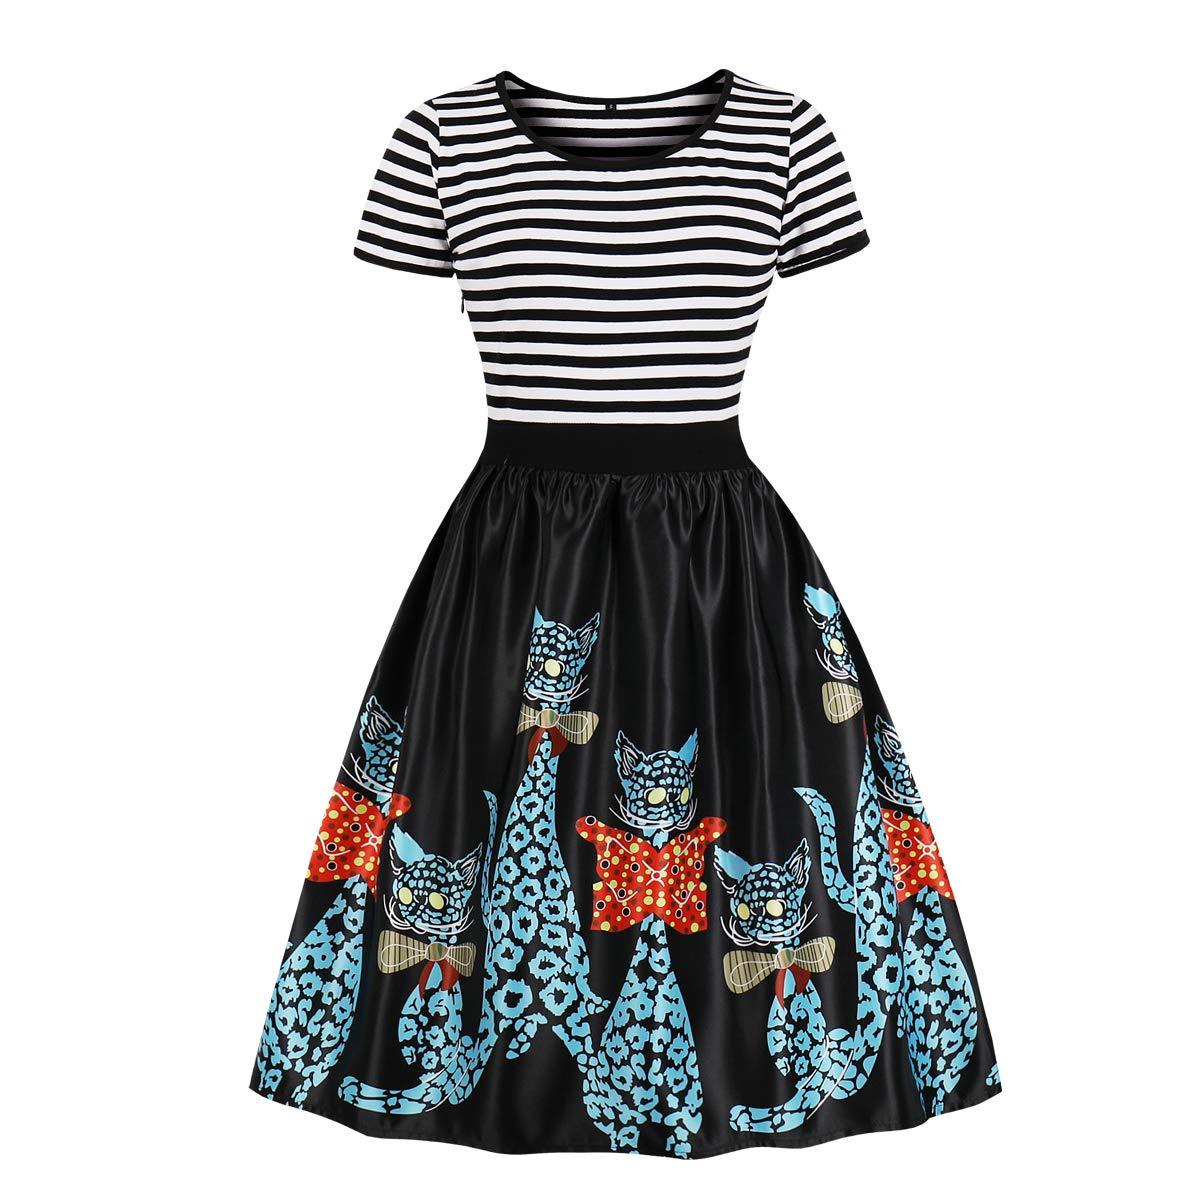 Wellwits Women's Sailor Striped Top Cats Print Tea Party Vintage Swing Dress 4XL